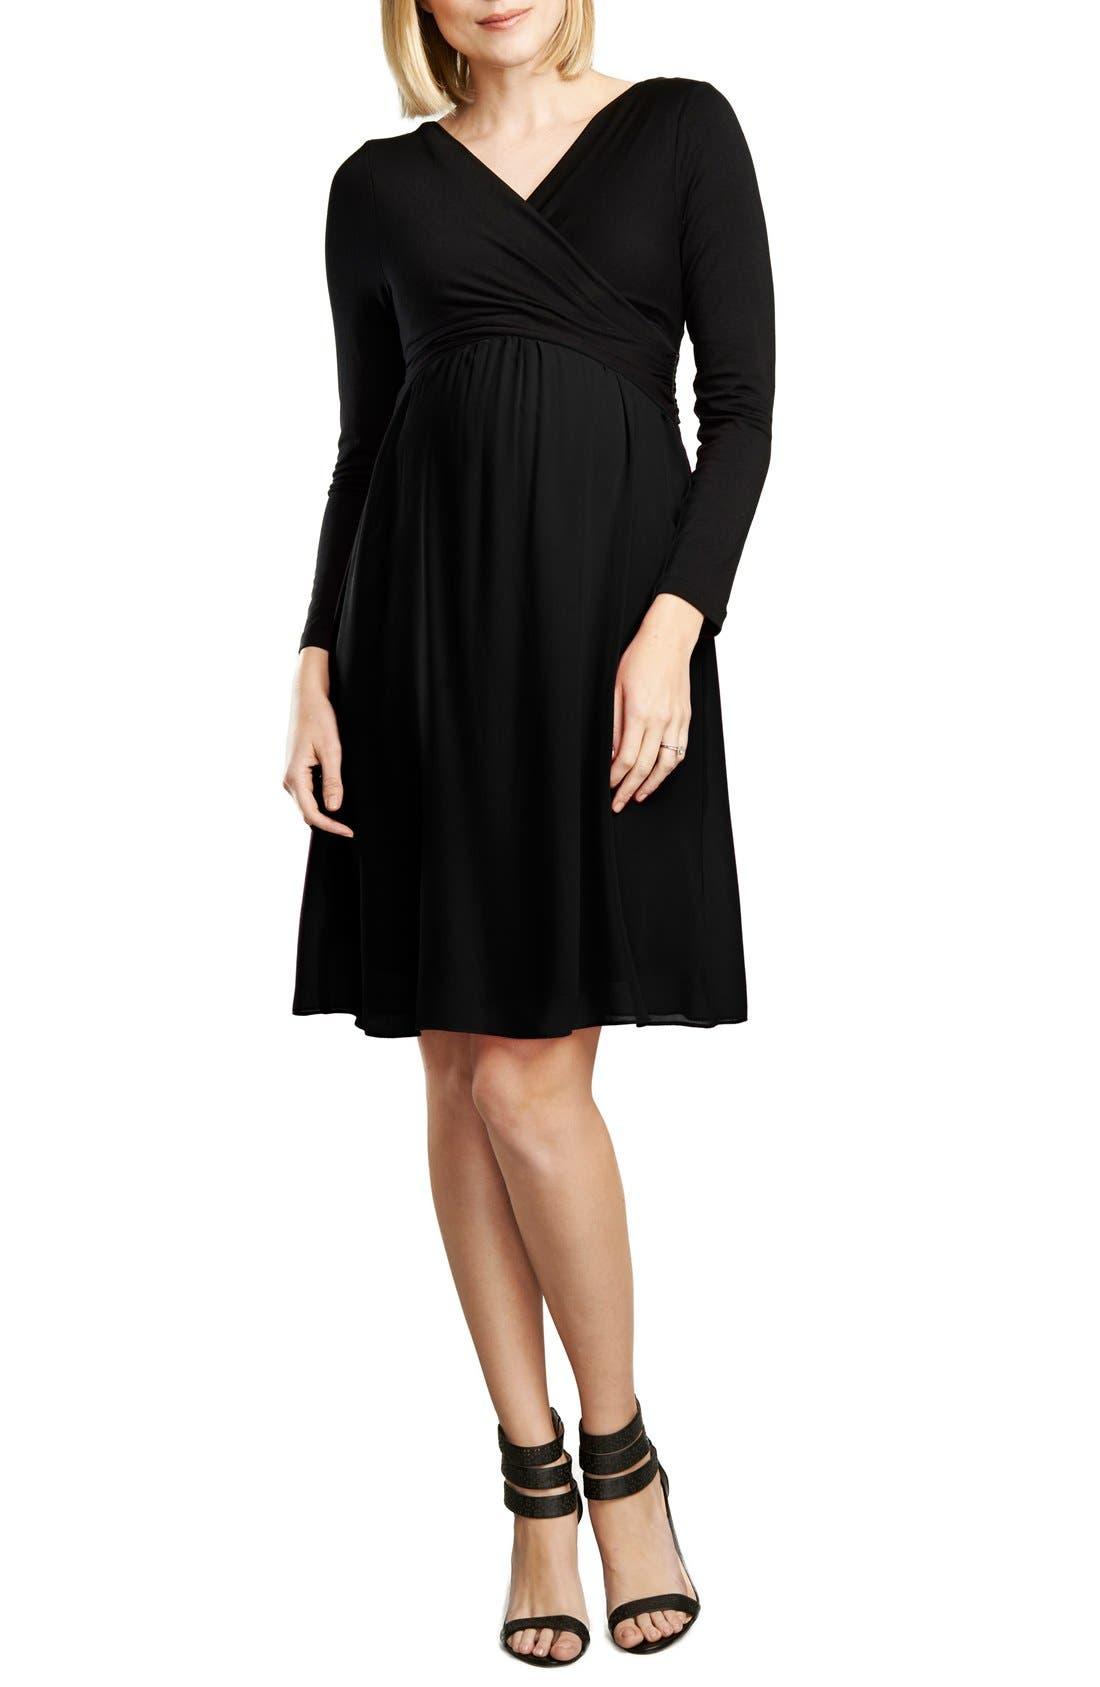 MATERNAL AMERICA, Crossover Maternity Dress, Main thumbnail 1, color, BLACK/BLACK